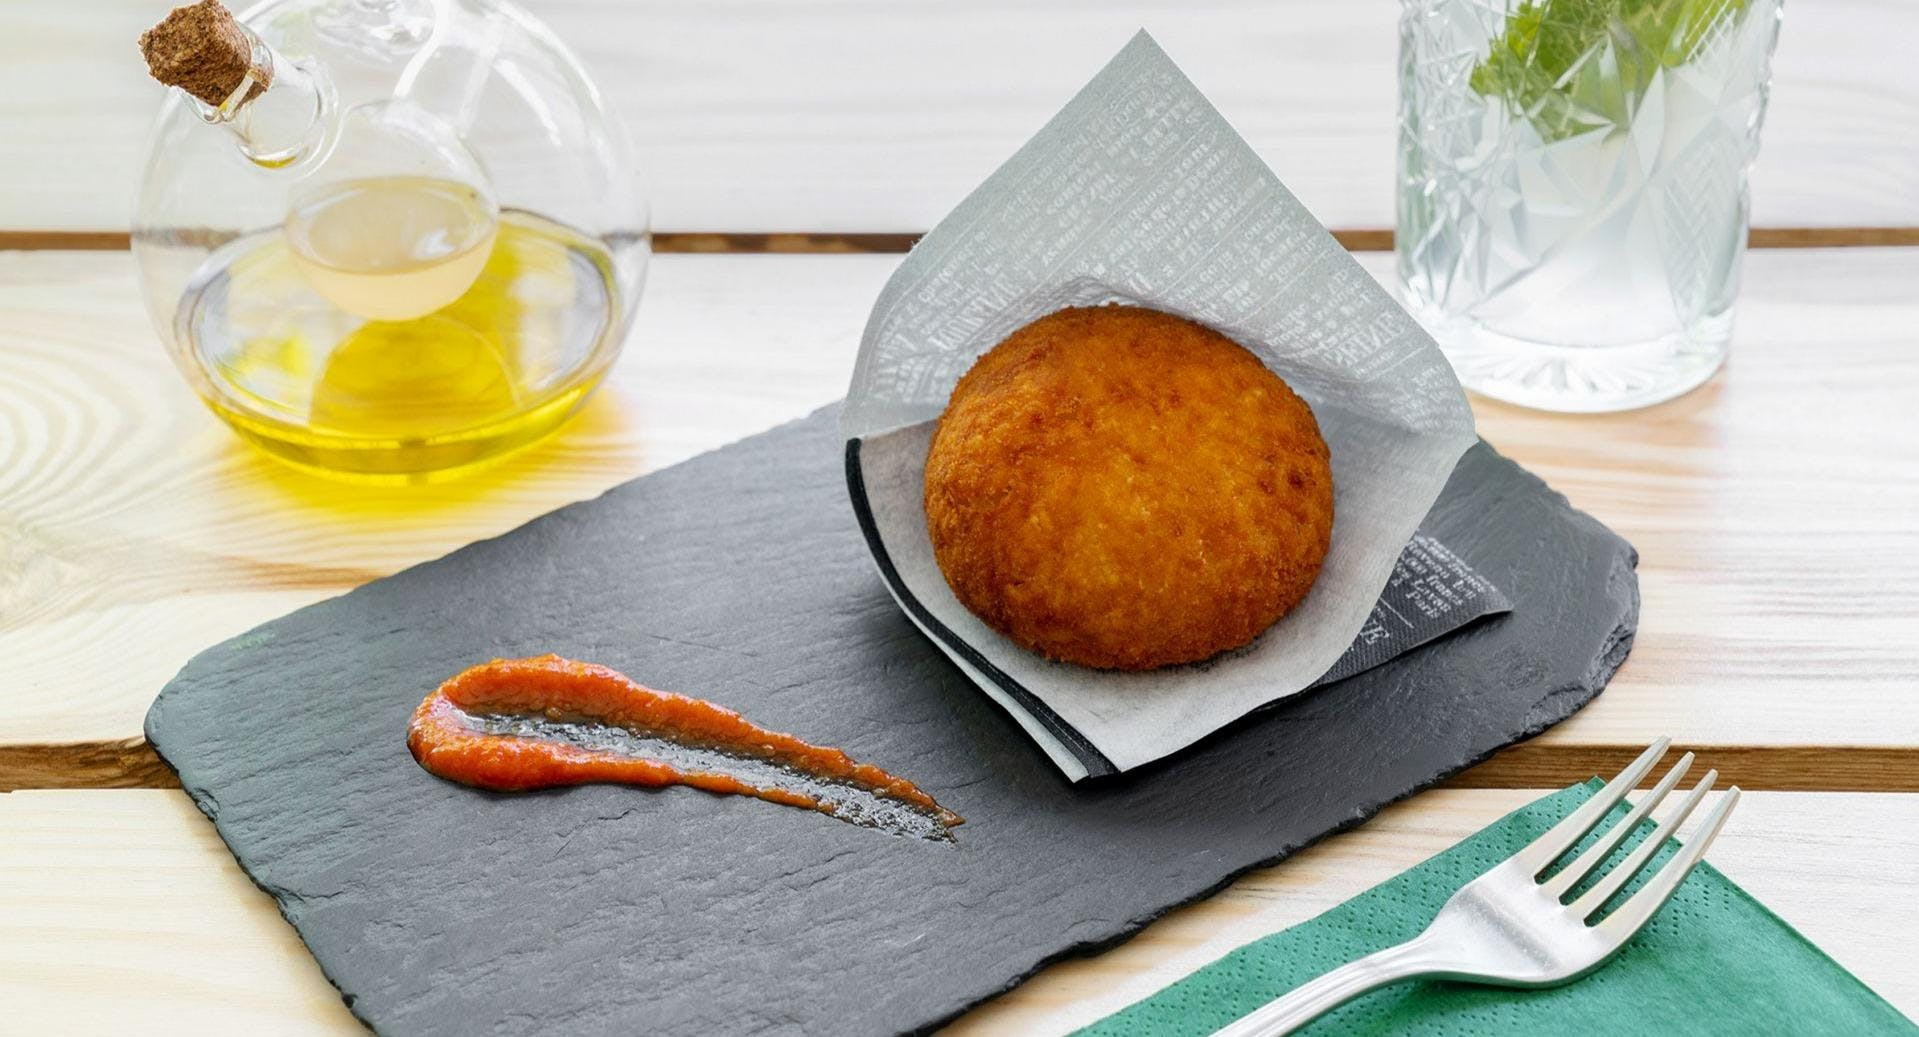 Antonello's Cevicheria & Street Food